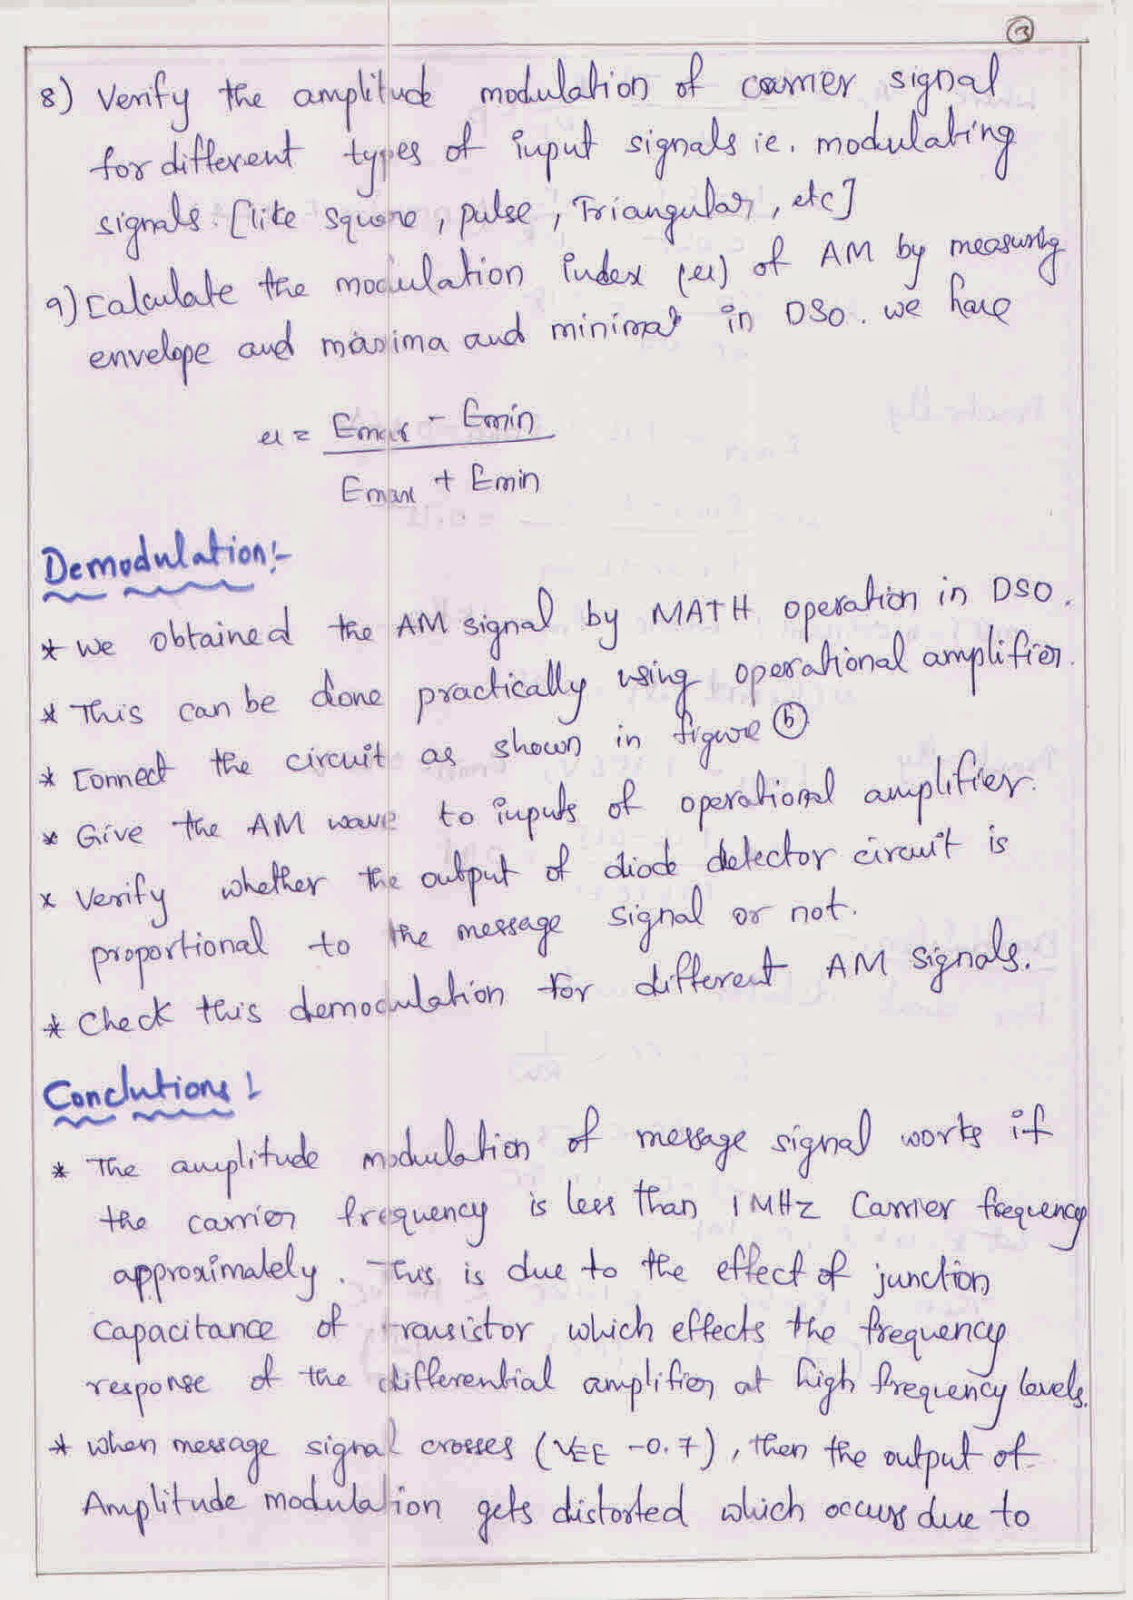 Amplitude DeModulation